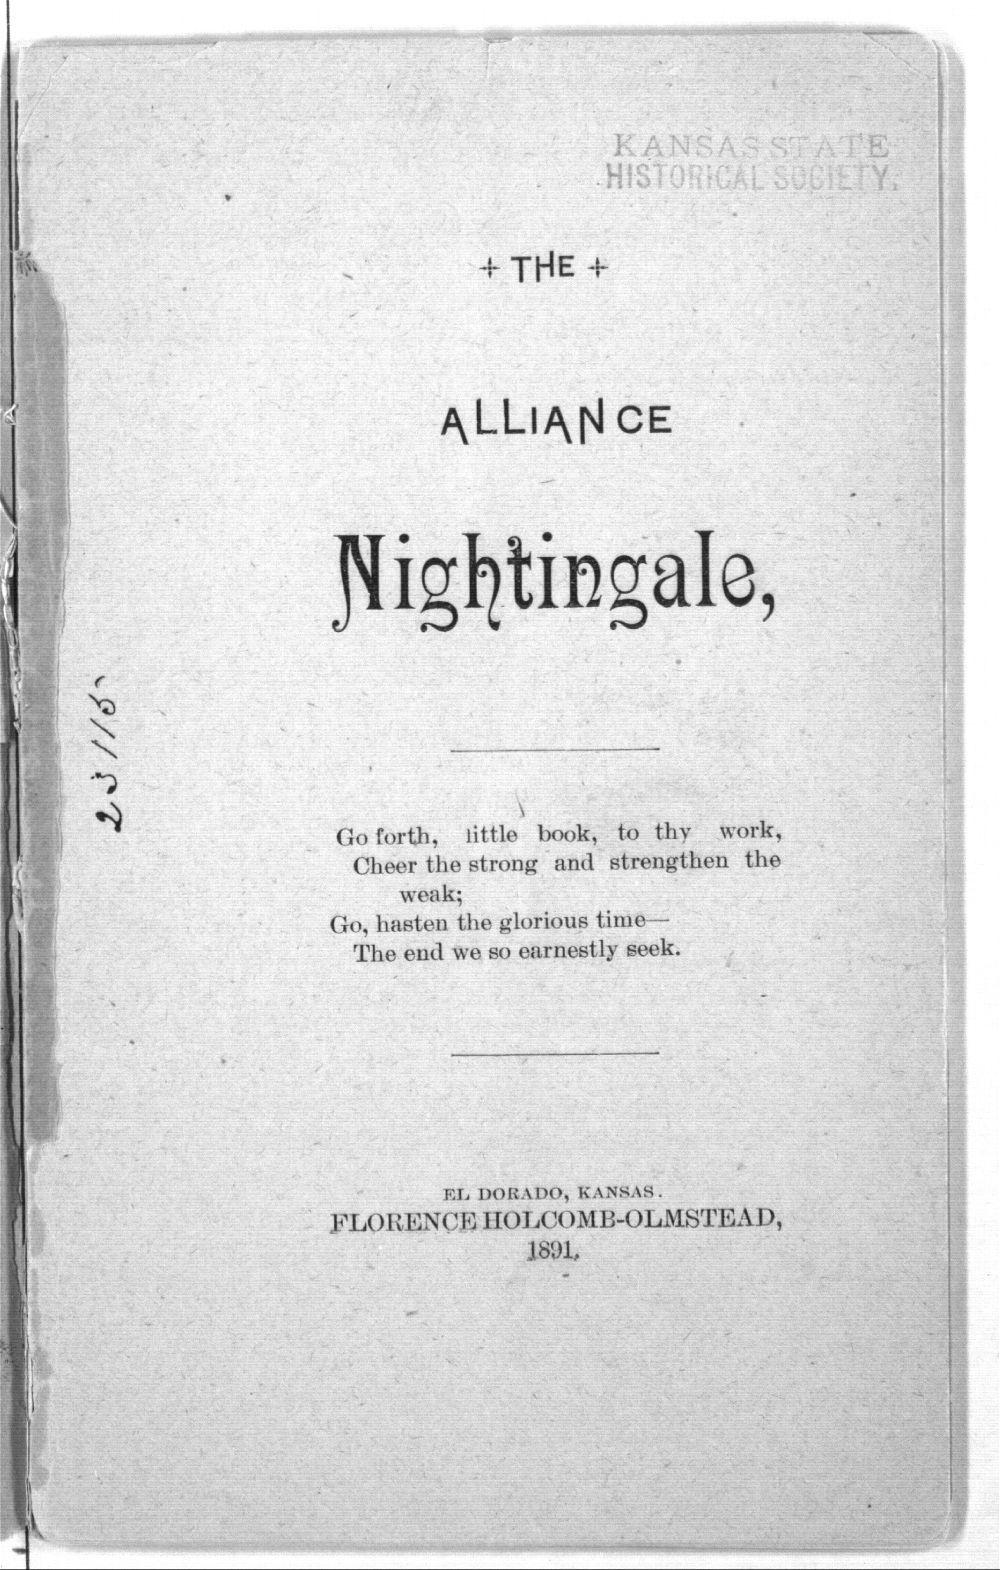 The alliance nightingale - 3